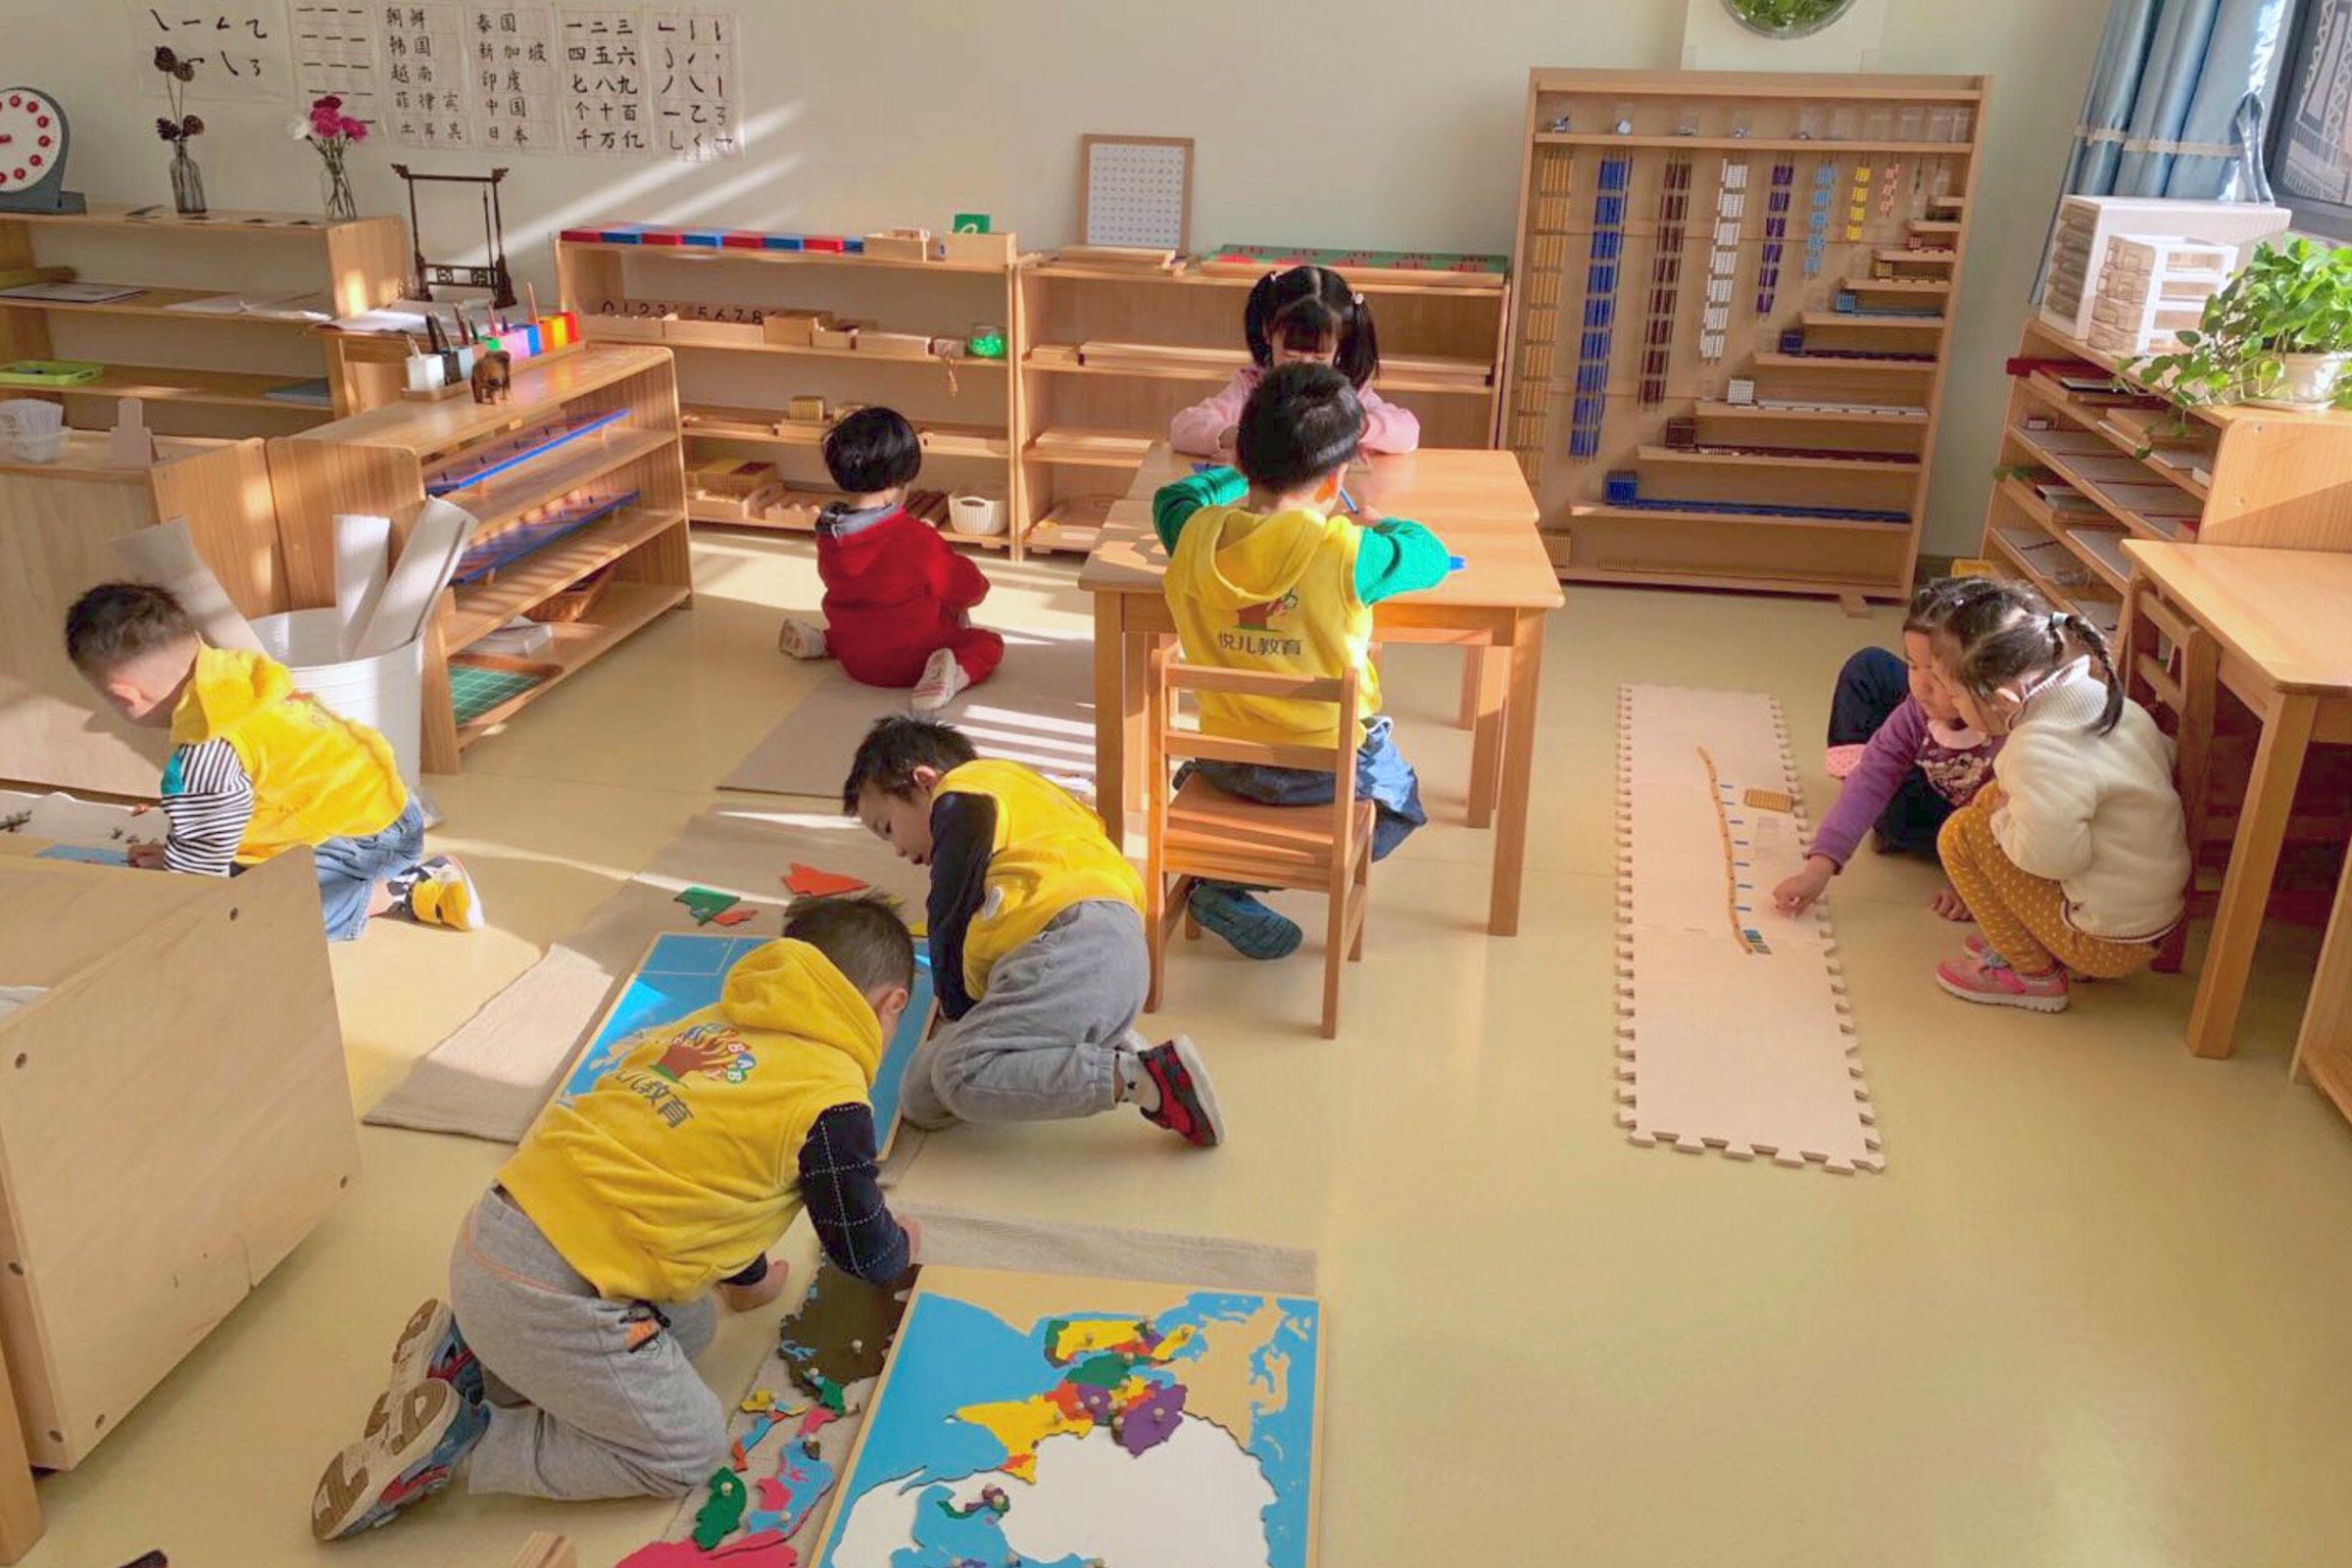 Children working in a Montessori classroom